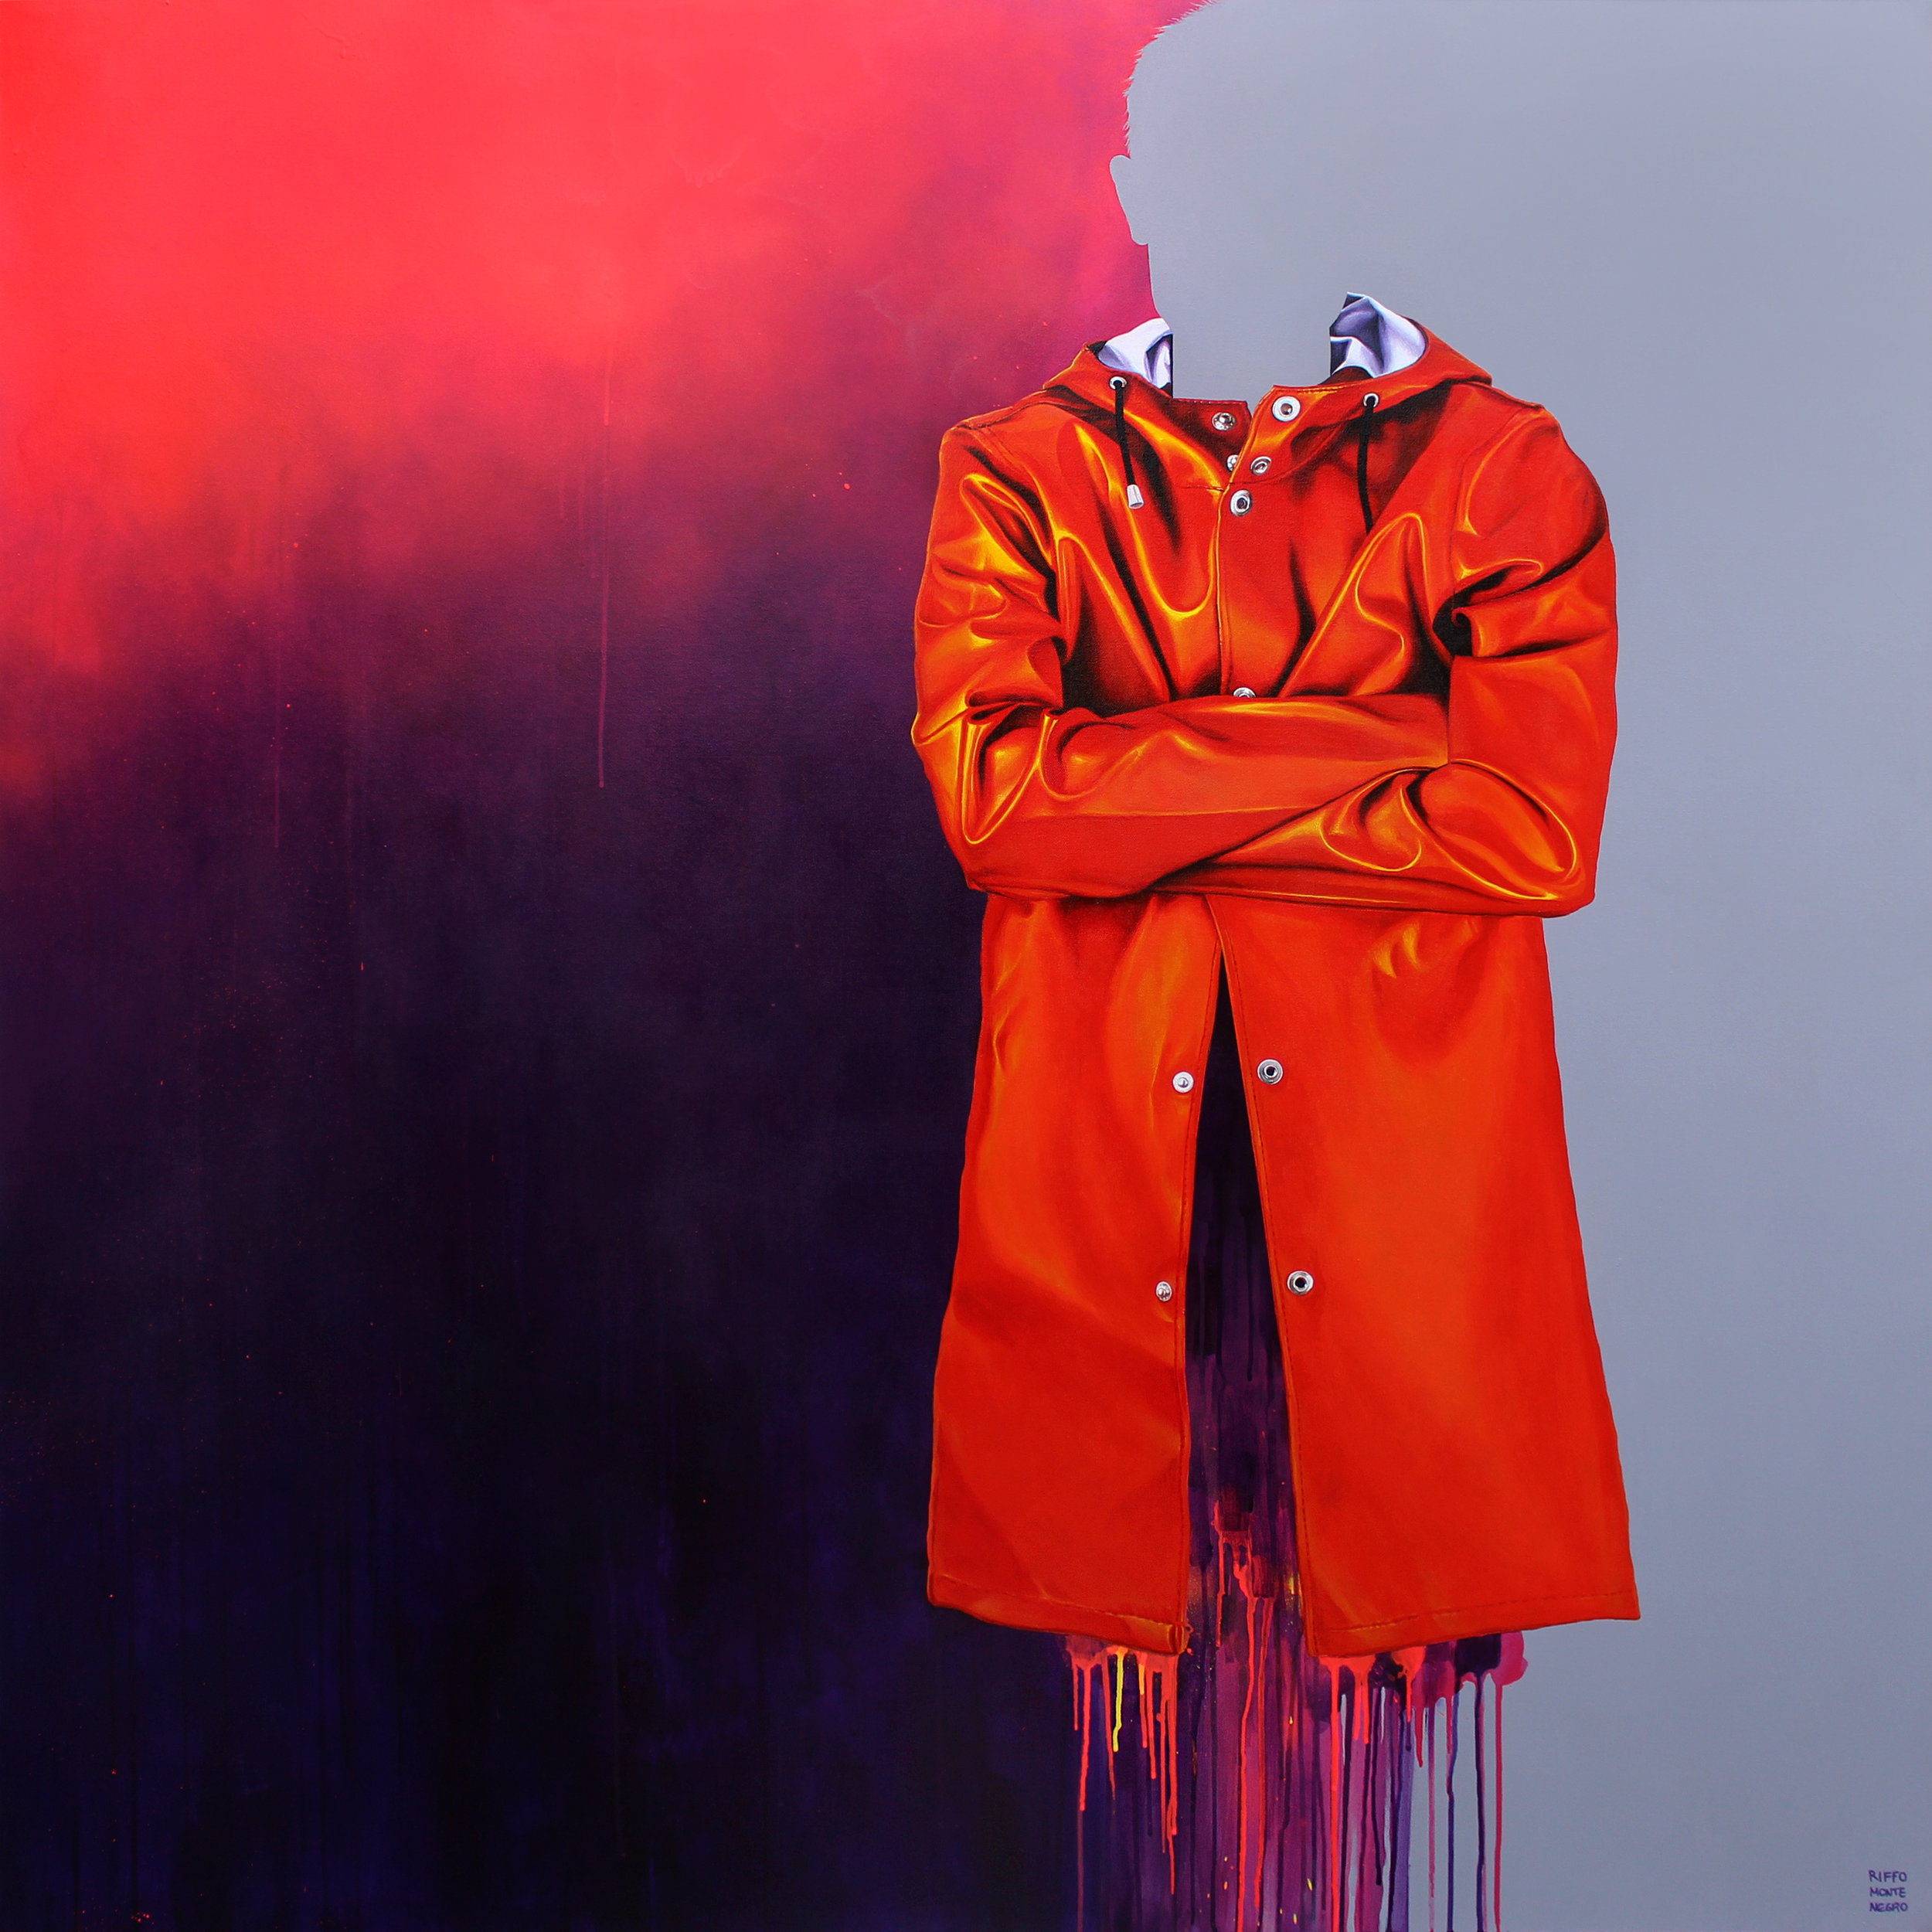 srm-raincoat3-150x150cm-2017.jpg